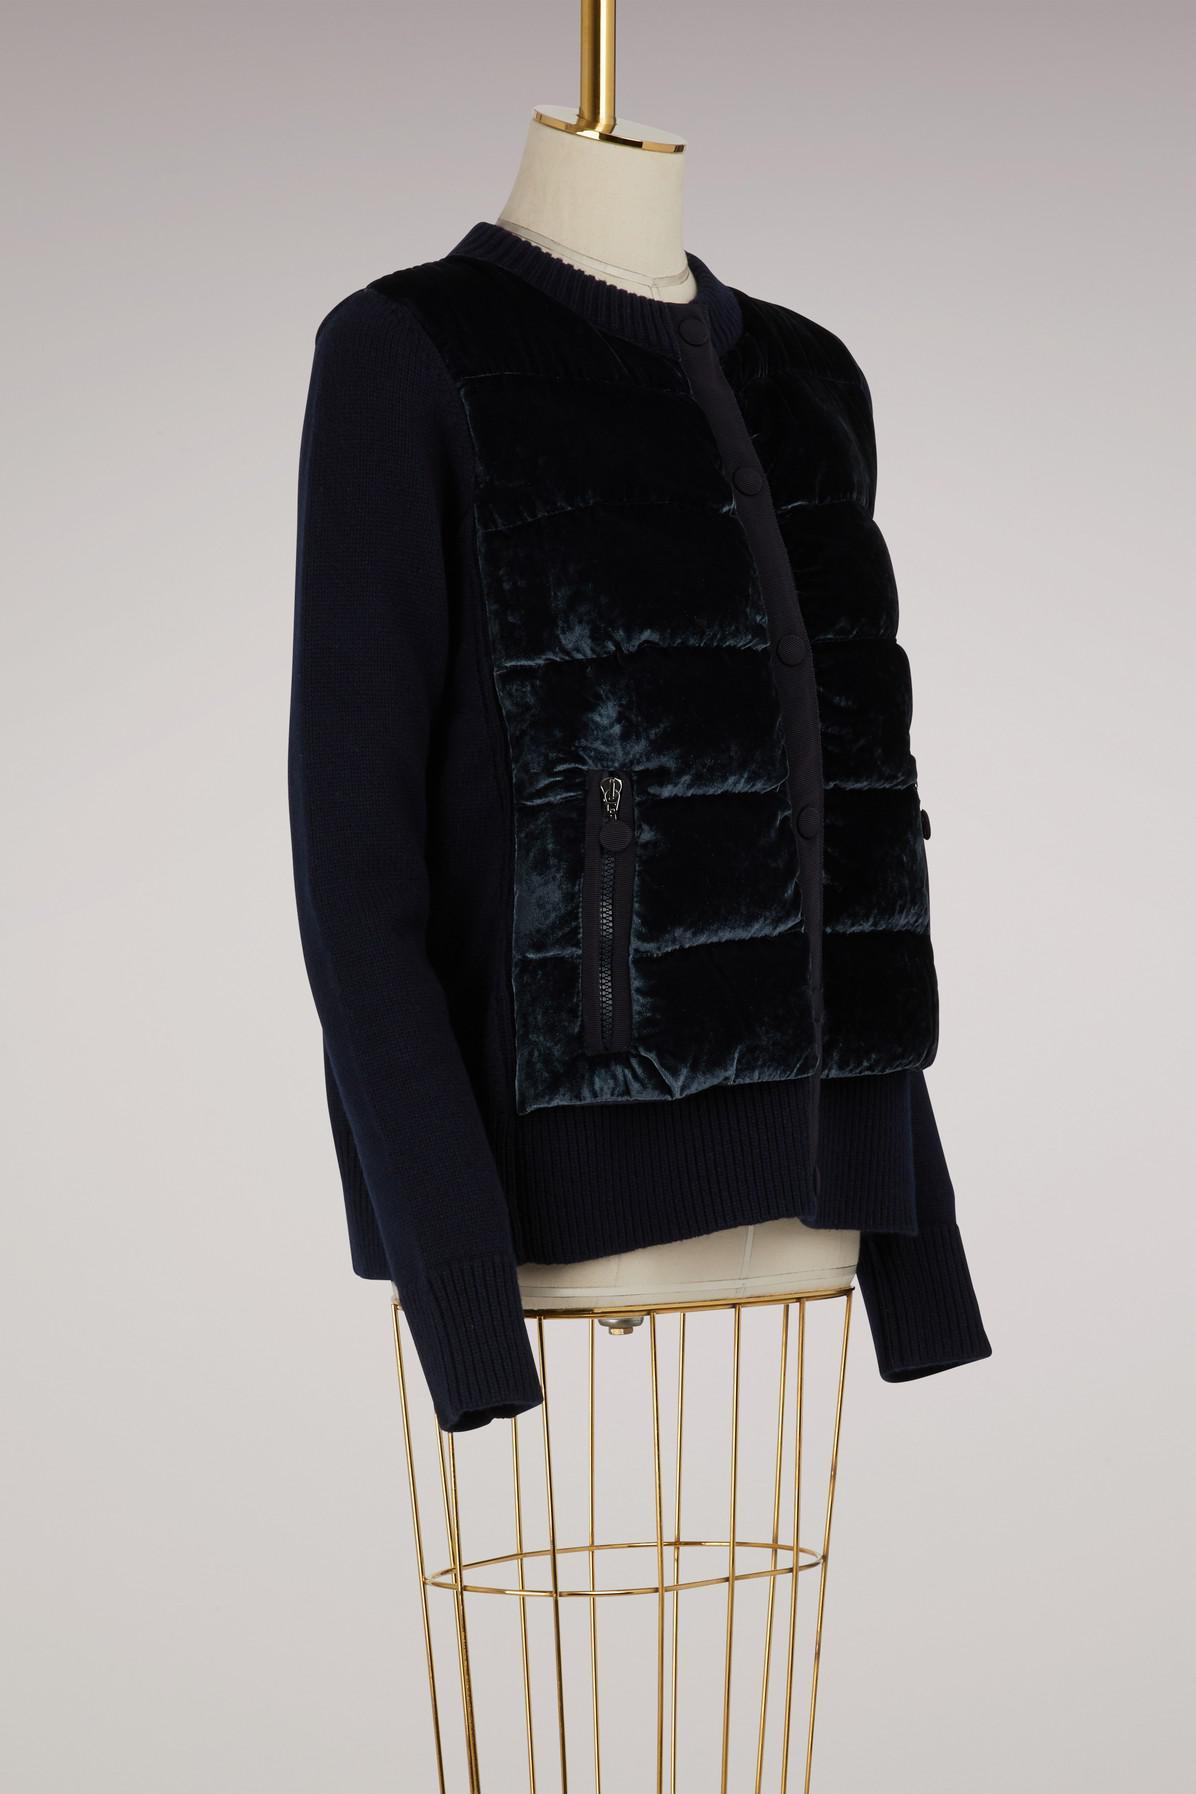 1a6cacfcc Lyst - Moncler Knitted And Velvet Bomber Jacket in Blue